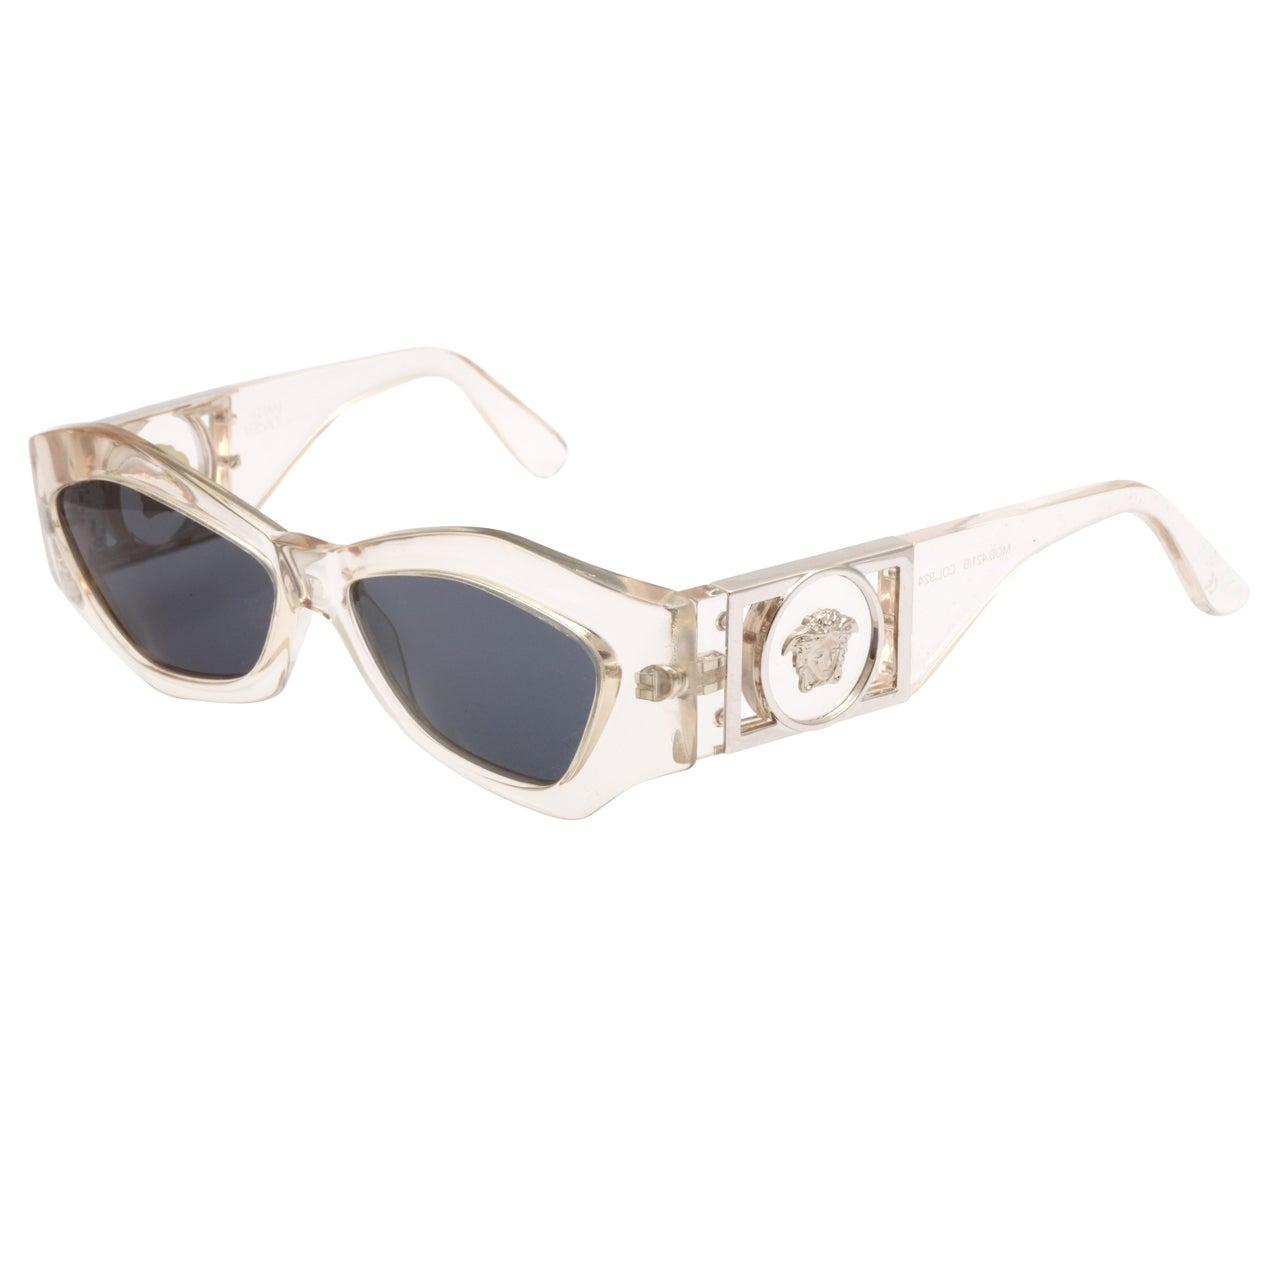 Vintage Gianni Versace Wayfarer Sunglasses Mod 405   ISEFAC Alternance